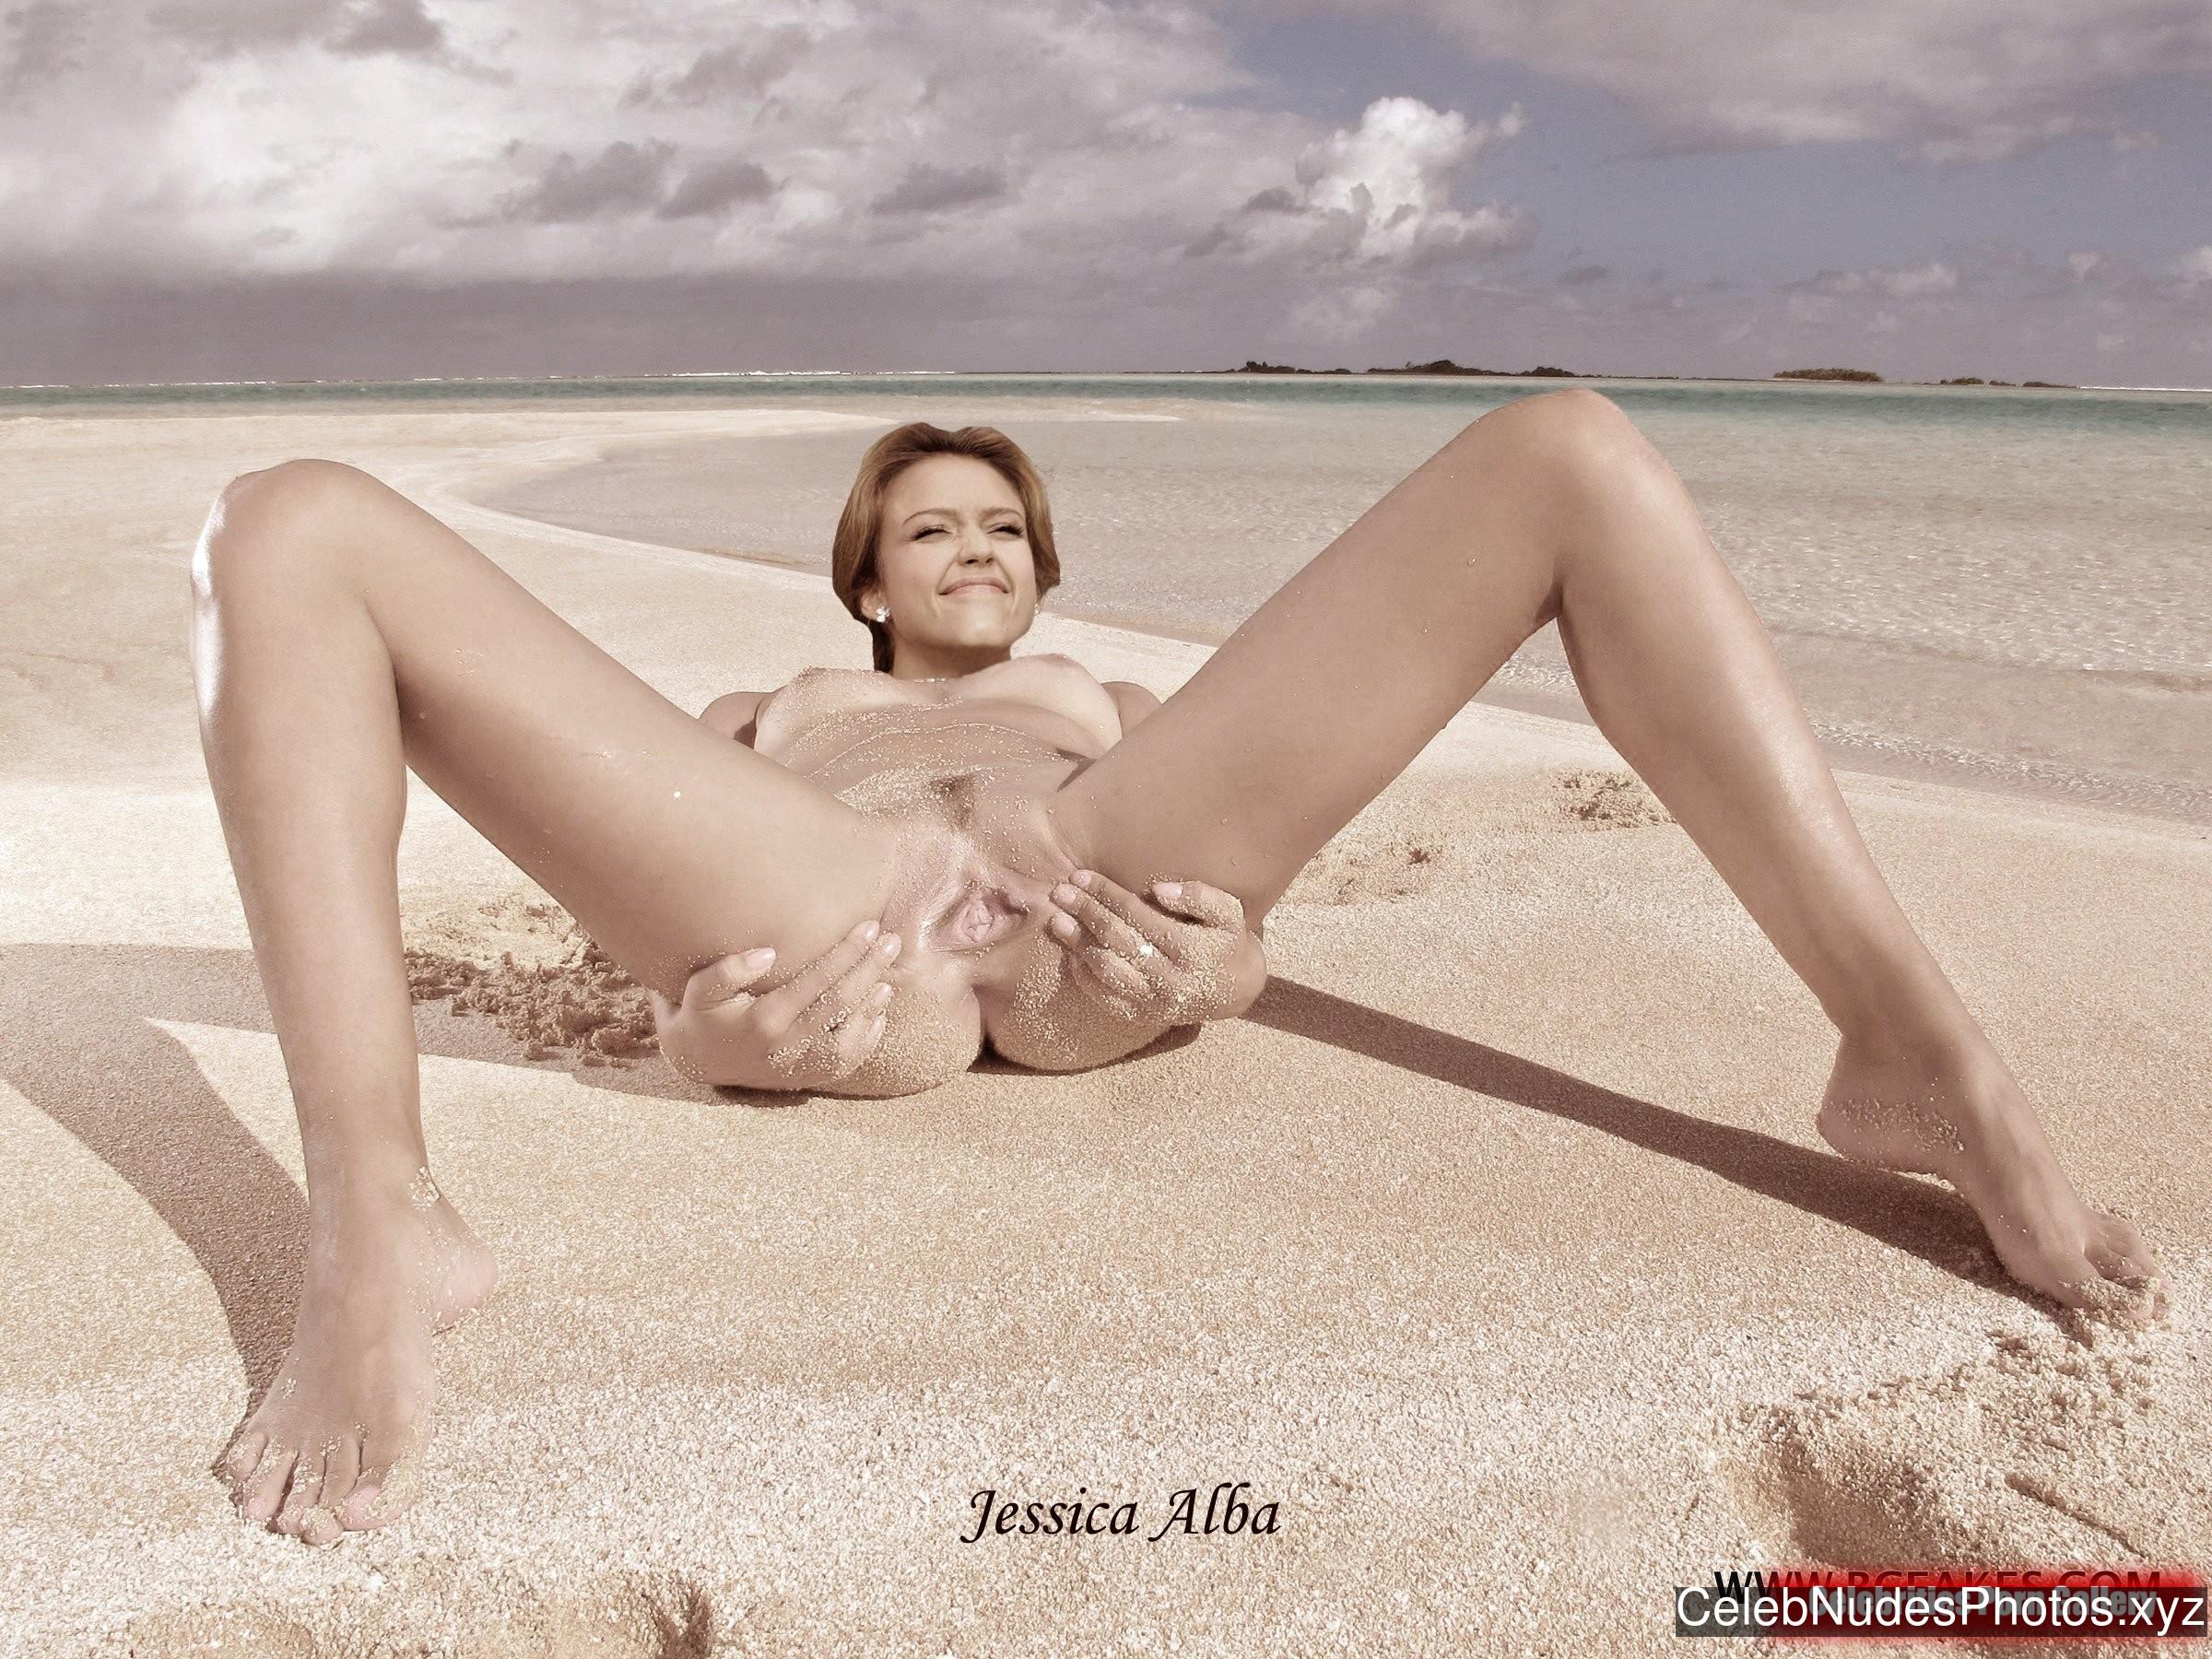 Jessica Alba Free Nude Celeb sexy 8